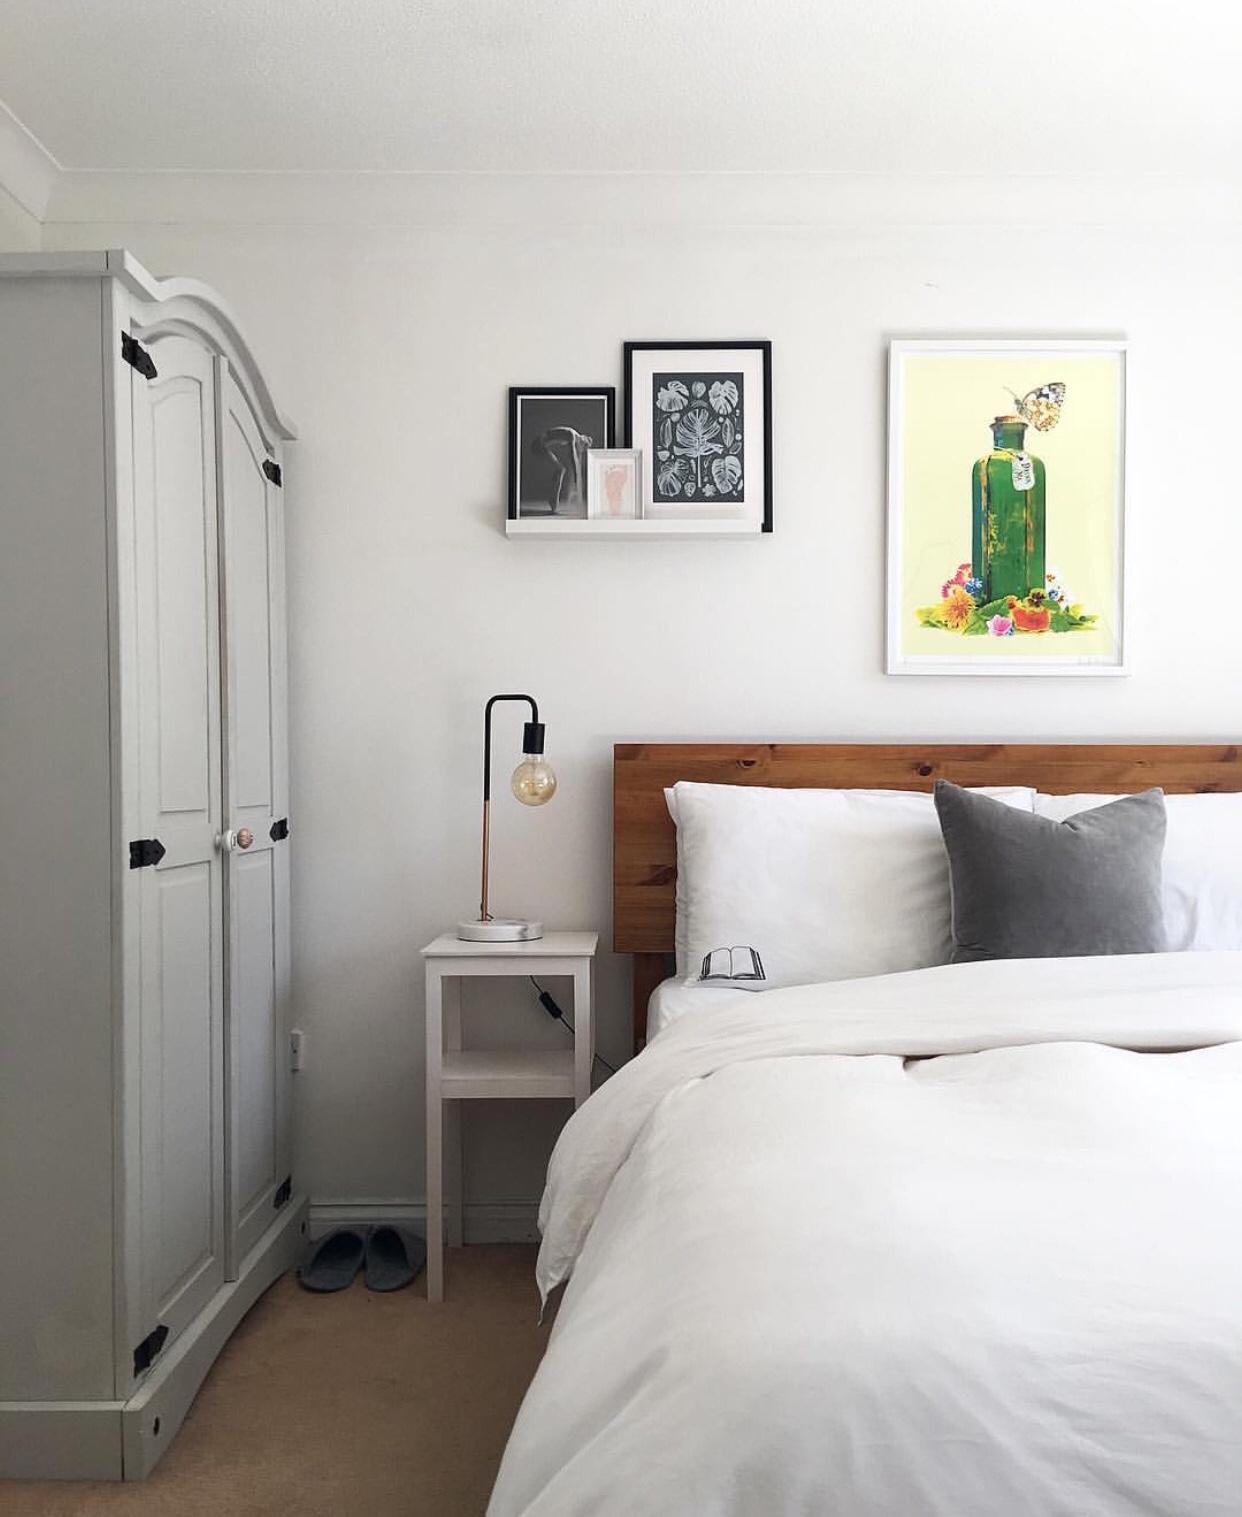 My bedroom details, Bed: Warren evans, Bedding: The White Company, Alice in Wonderland print: Print Club London